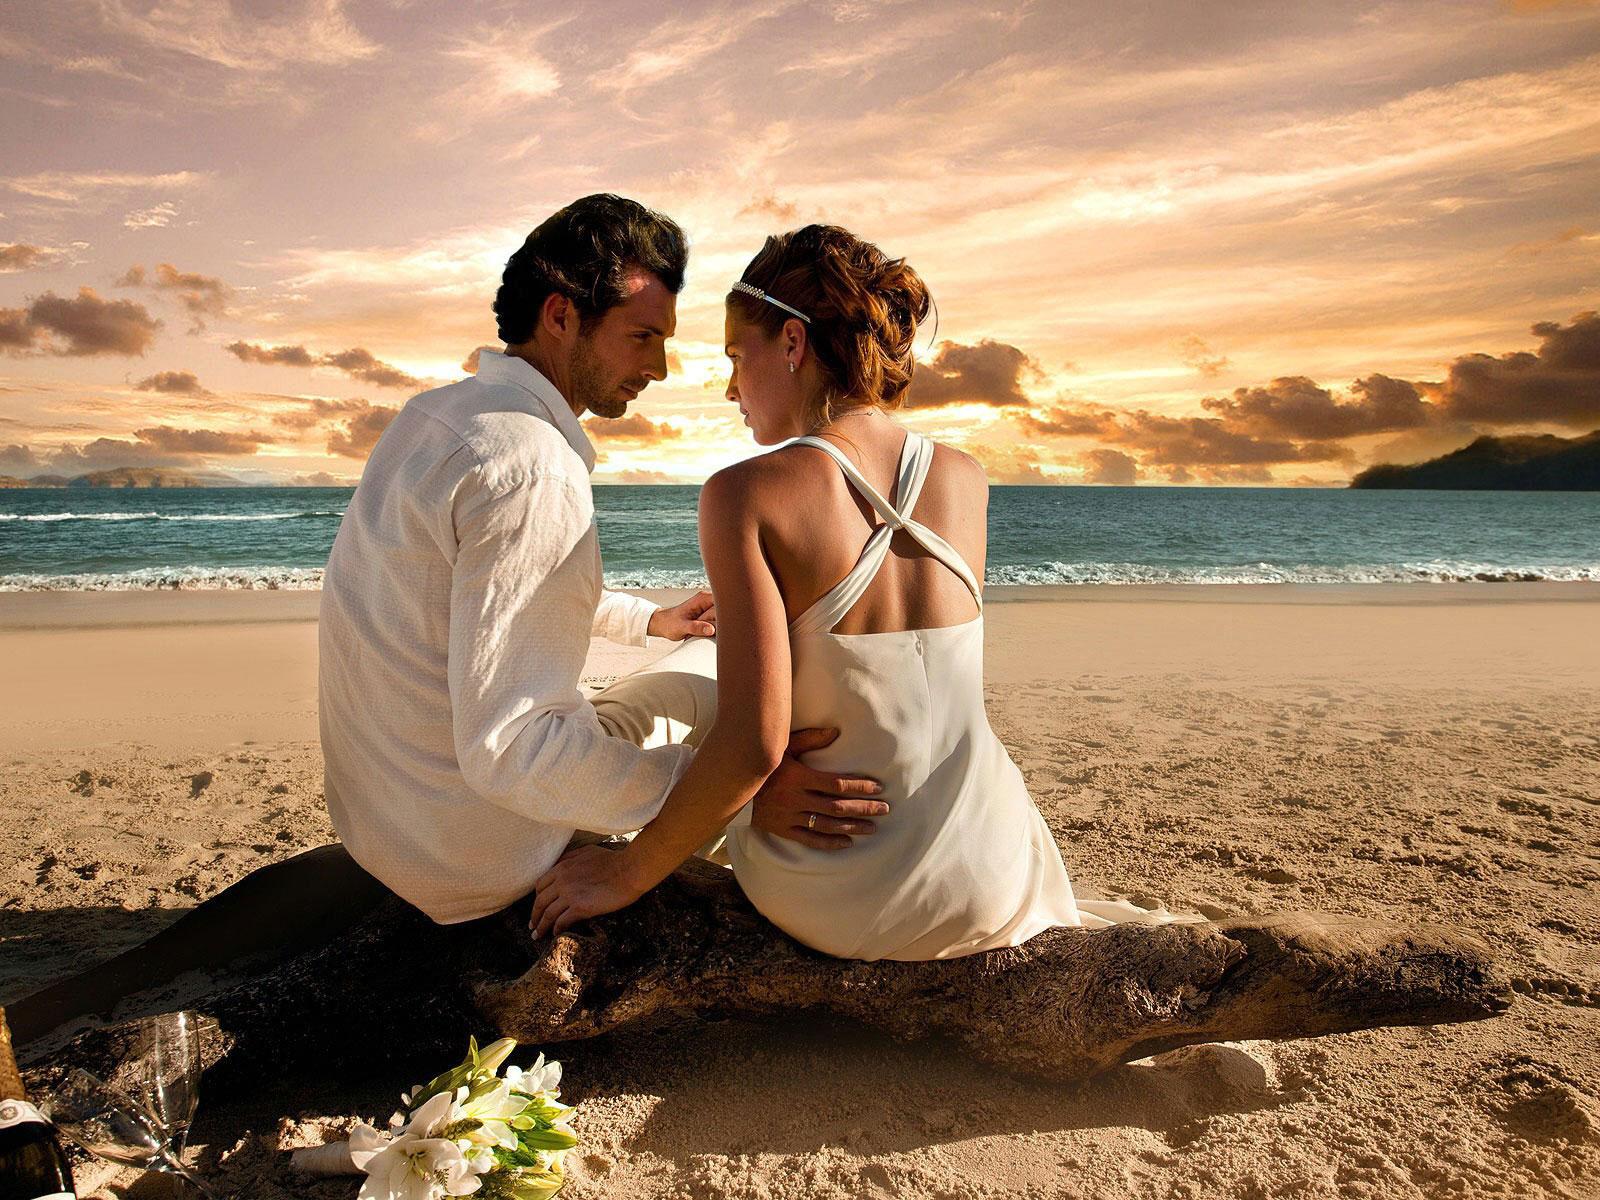 koleksi foto foto romantis, foto romantis, gambar romantis, wallpaper ...